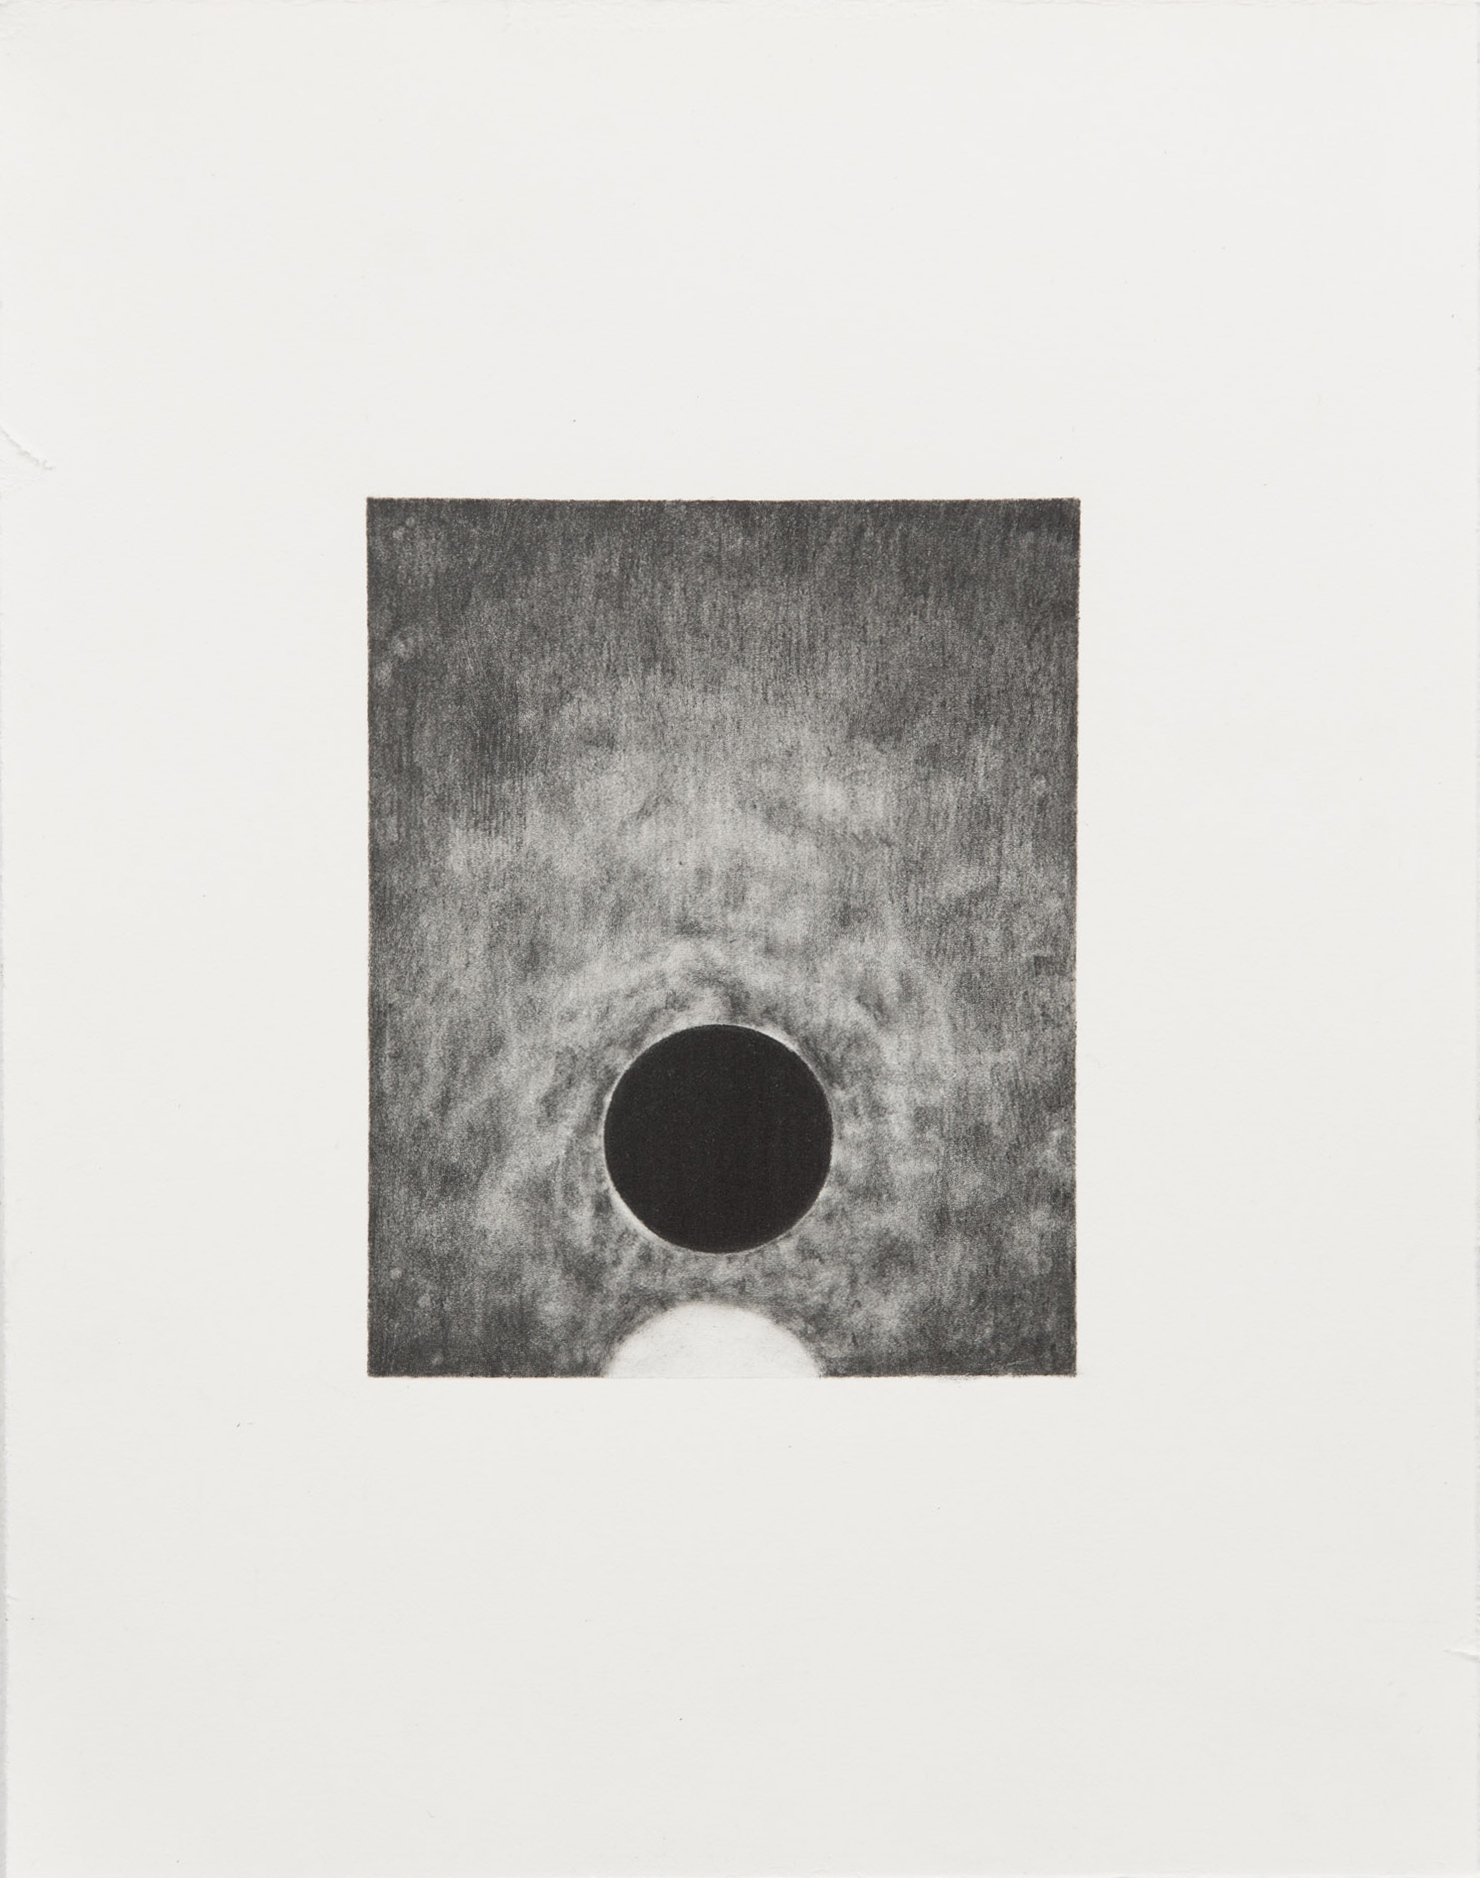 "Carl Trahan,  O   3,  2018, graphite sur papier, 12 x 10 cm (5"" x 4"")"